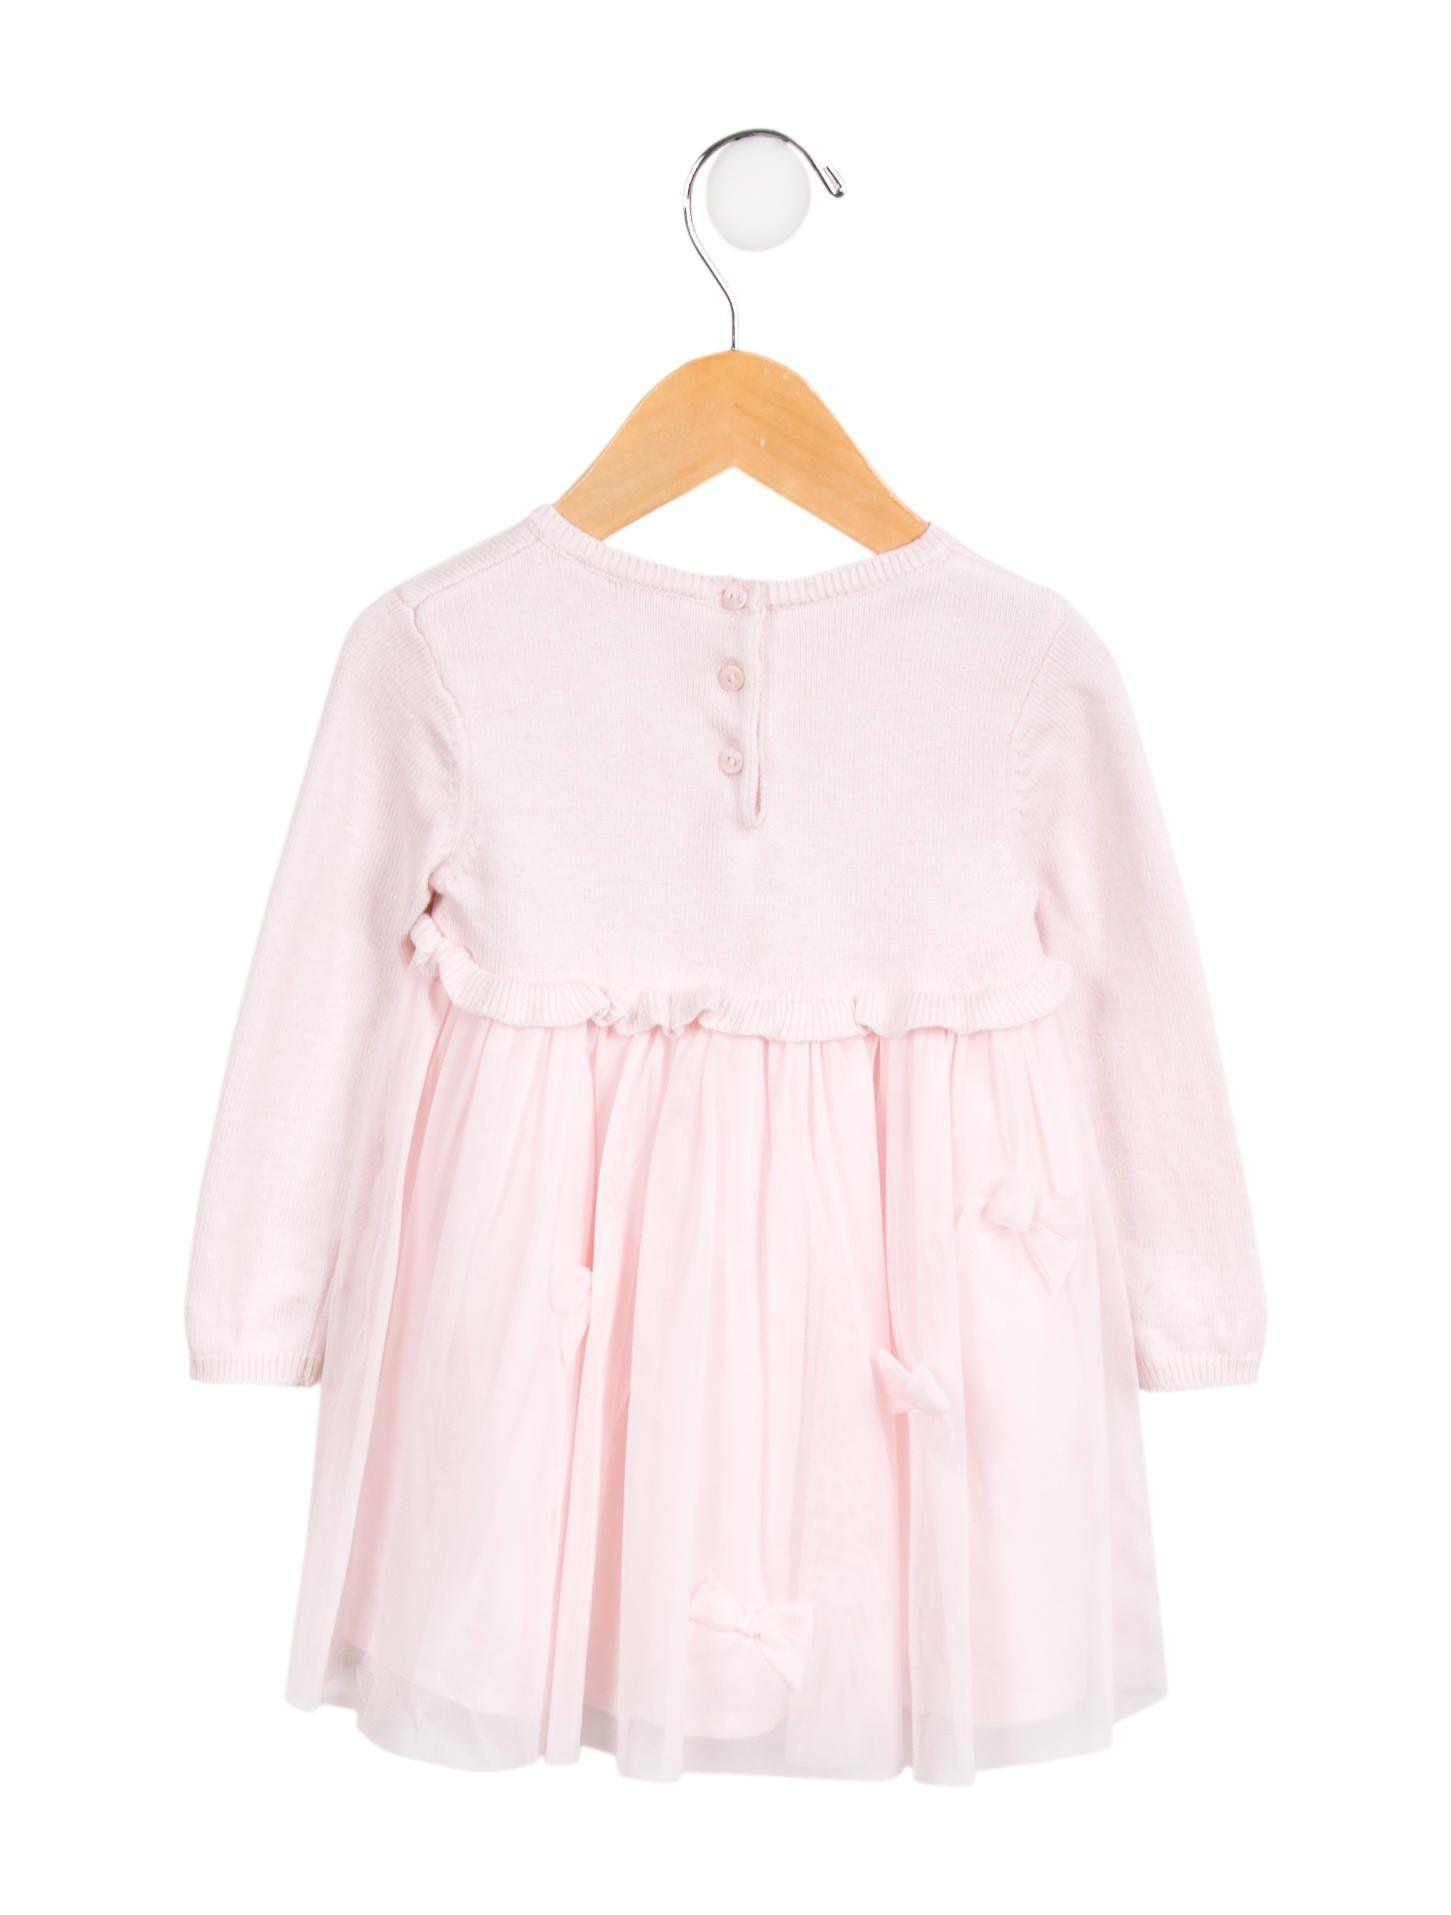 fe8f7afbdee5 Lili Gaufrette Girls  Tulle Bow-Accented Dress